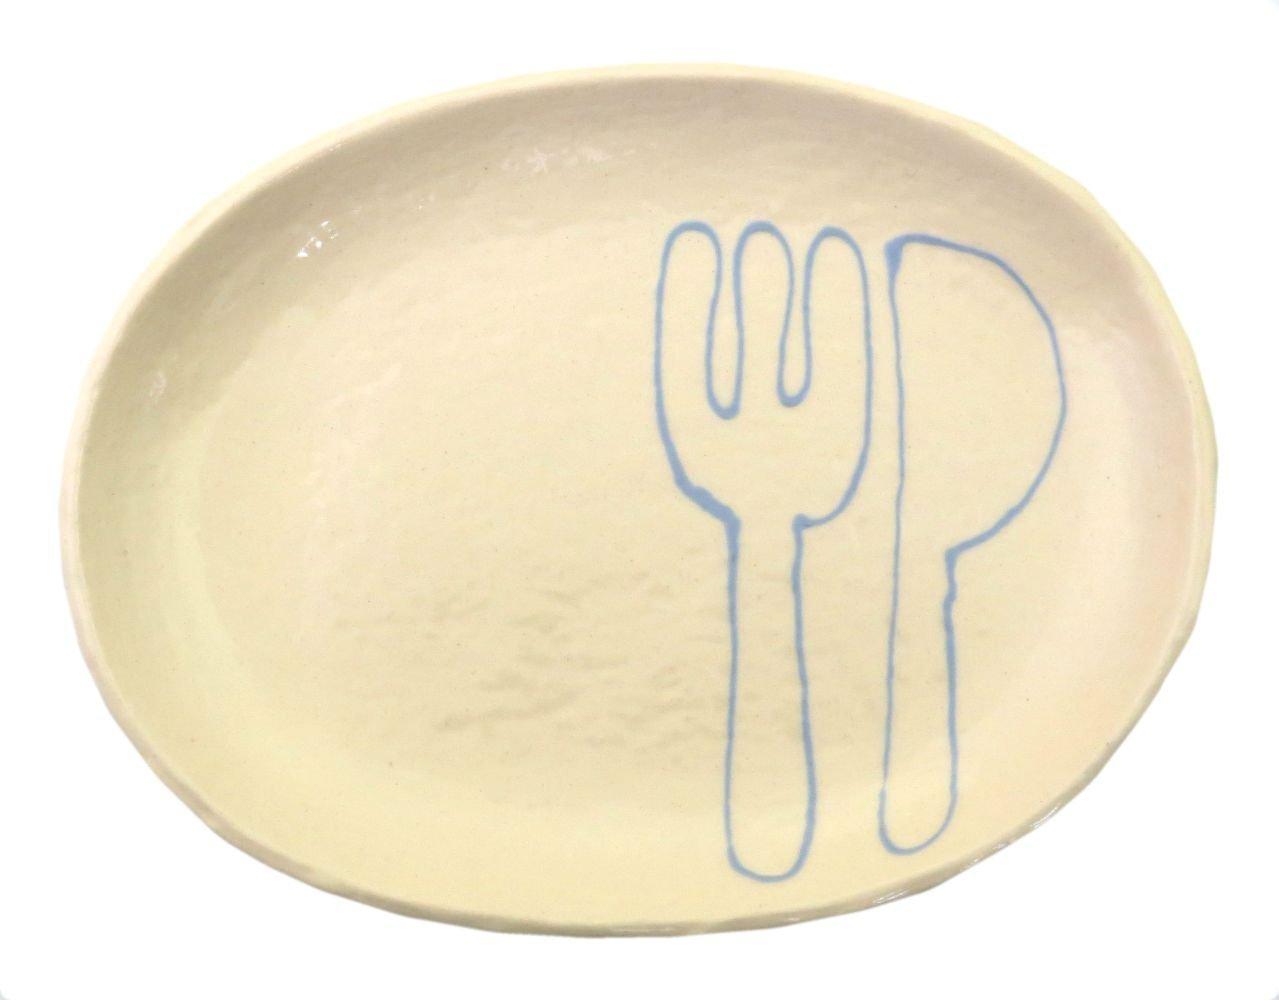 18cmの取り皿に使える楕円皿 3サイズの真ん中のお皿【楕円皿中(フォーク&ナイフブルー)】